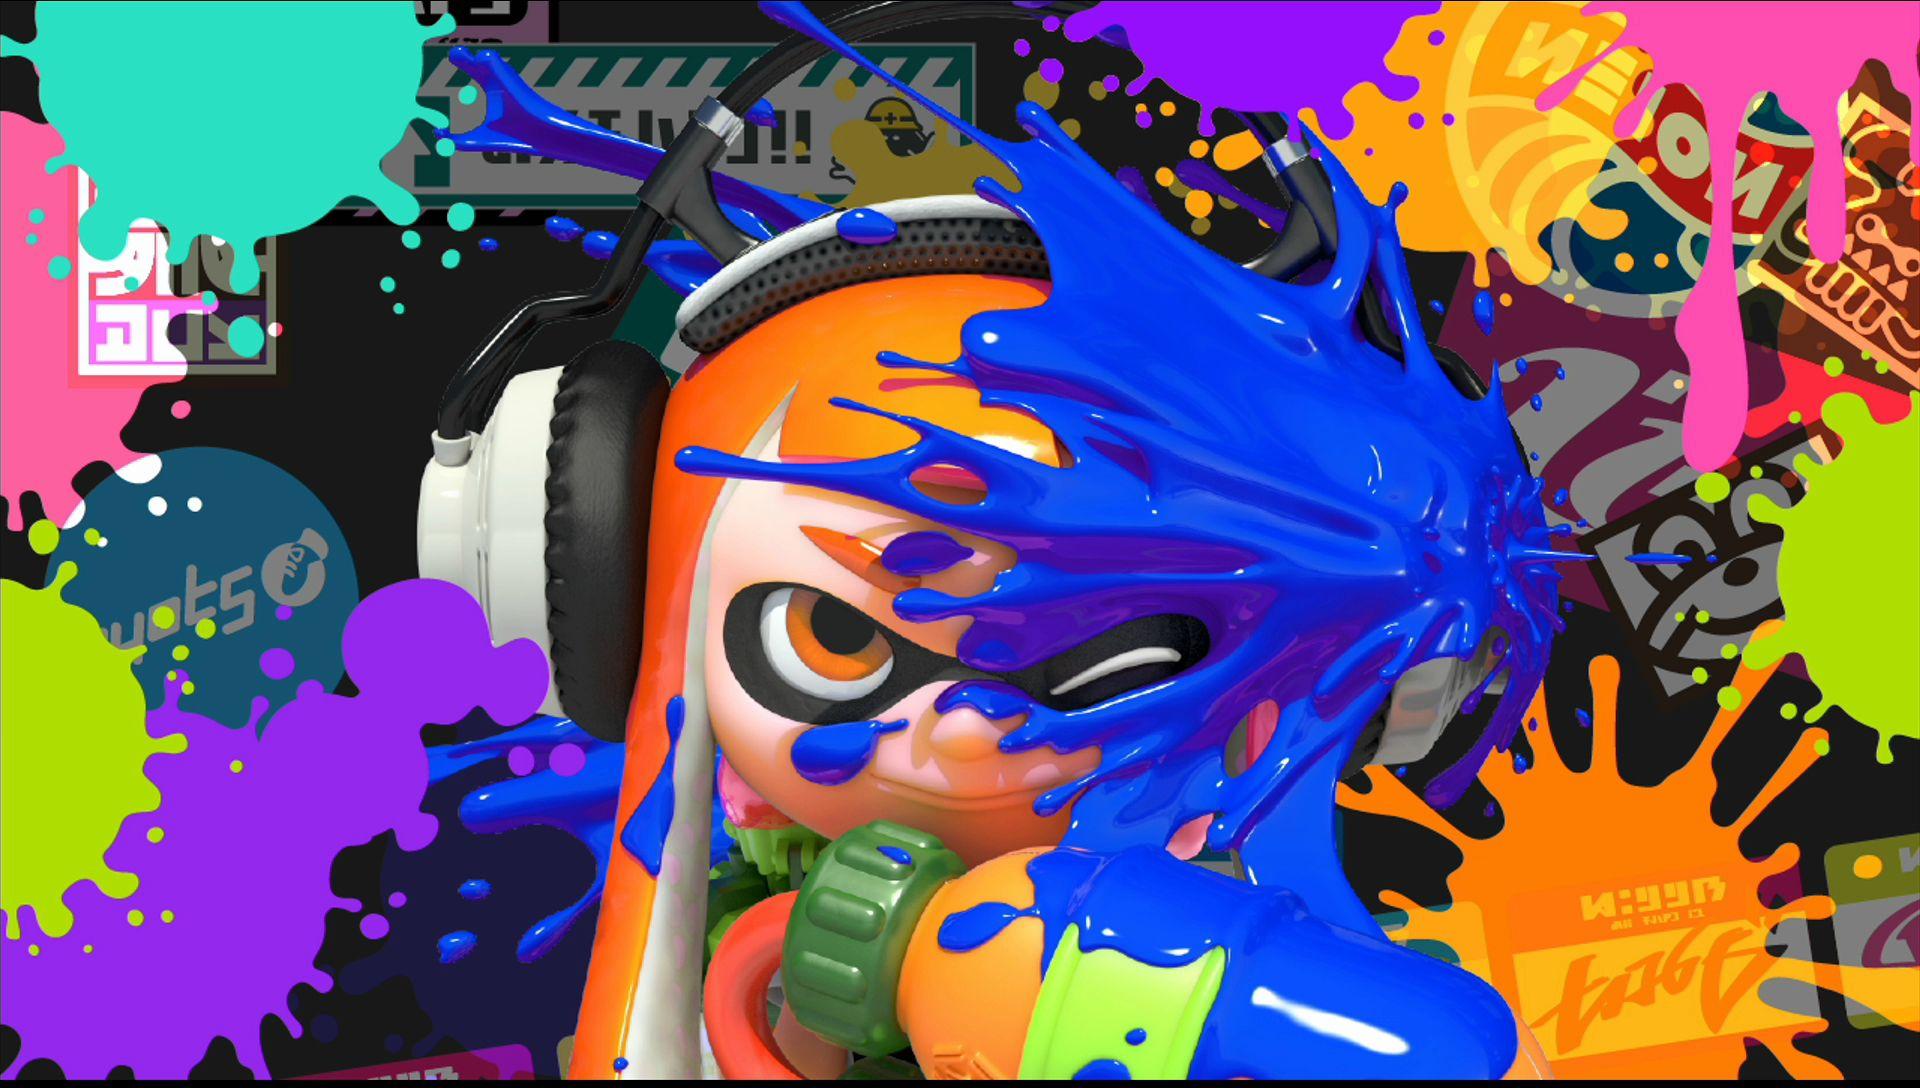 De nouvelles images pour Splatoon  Nintendo Wii U  Nintendo Master